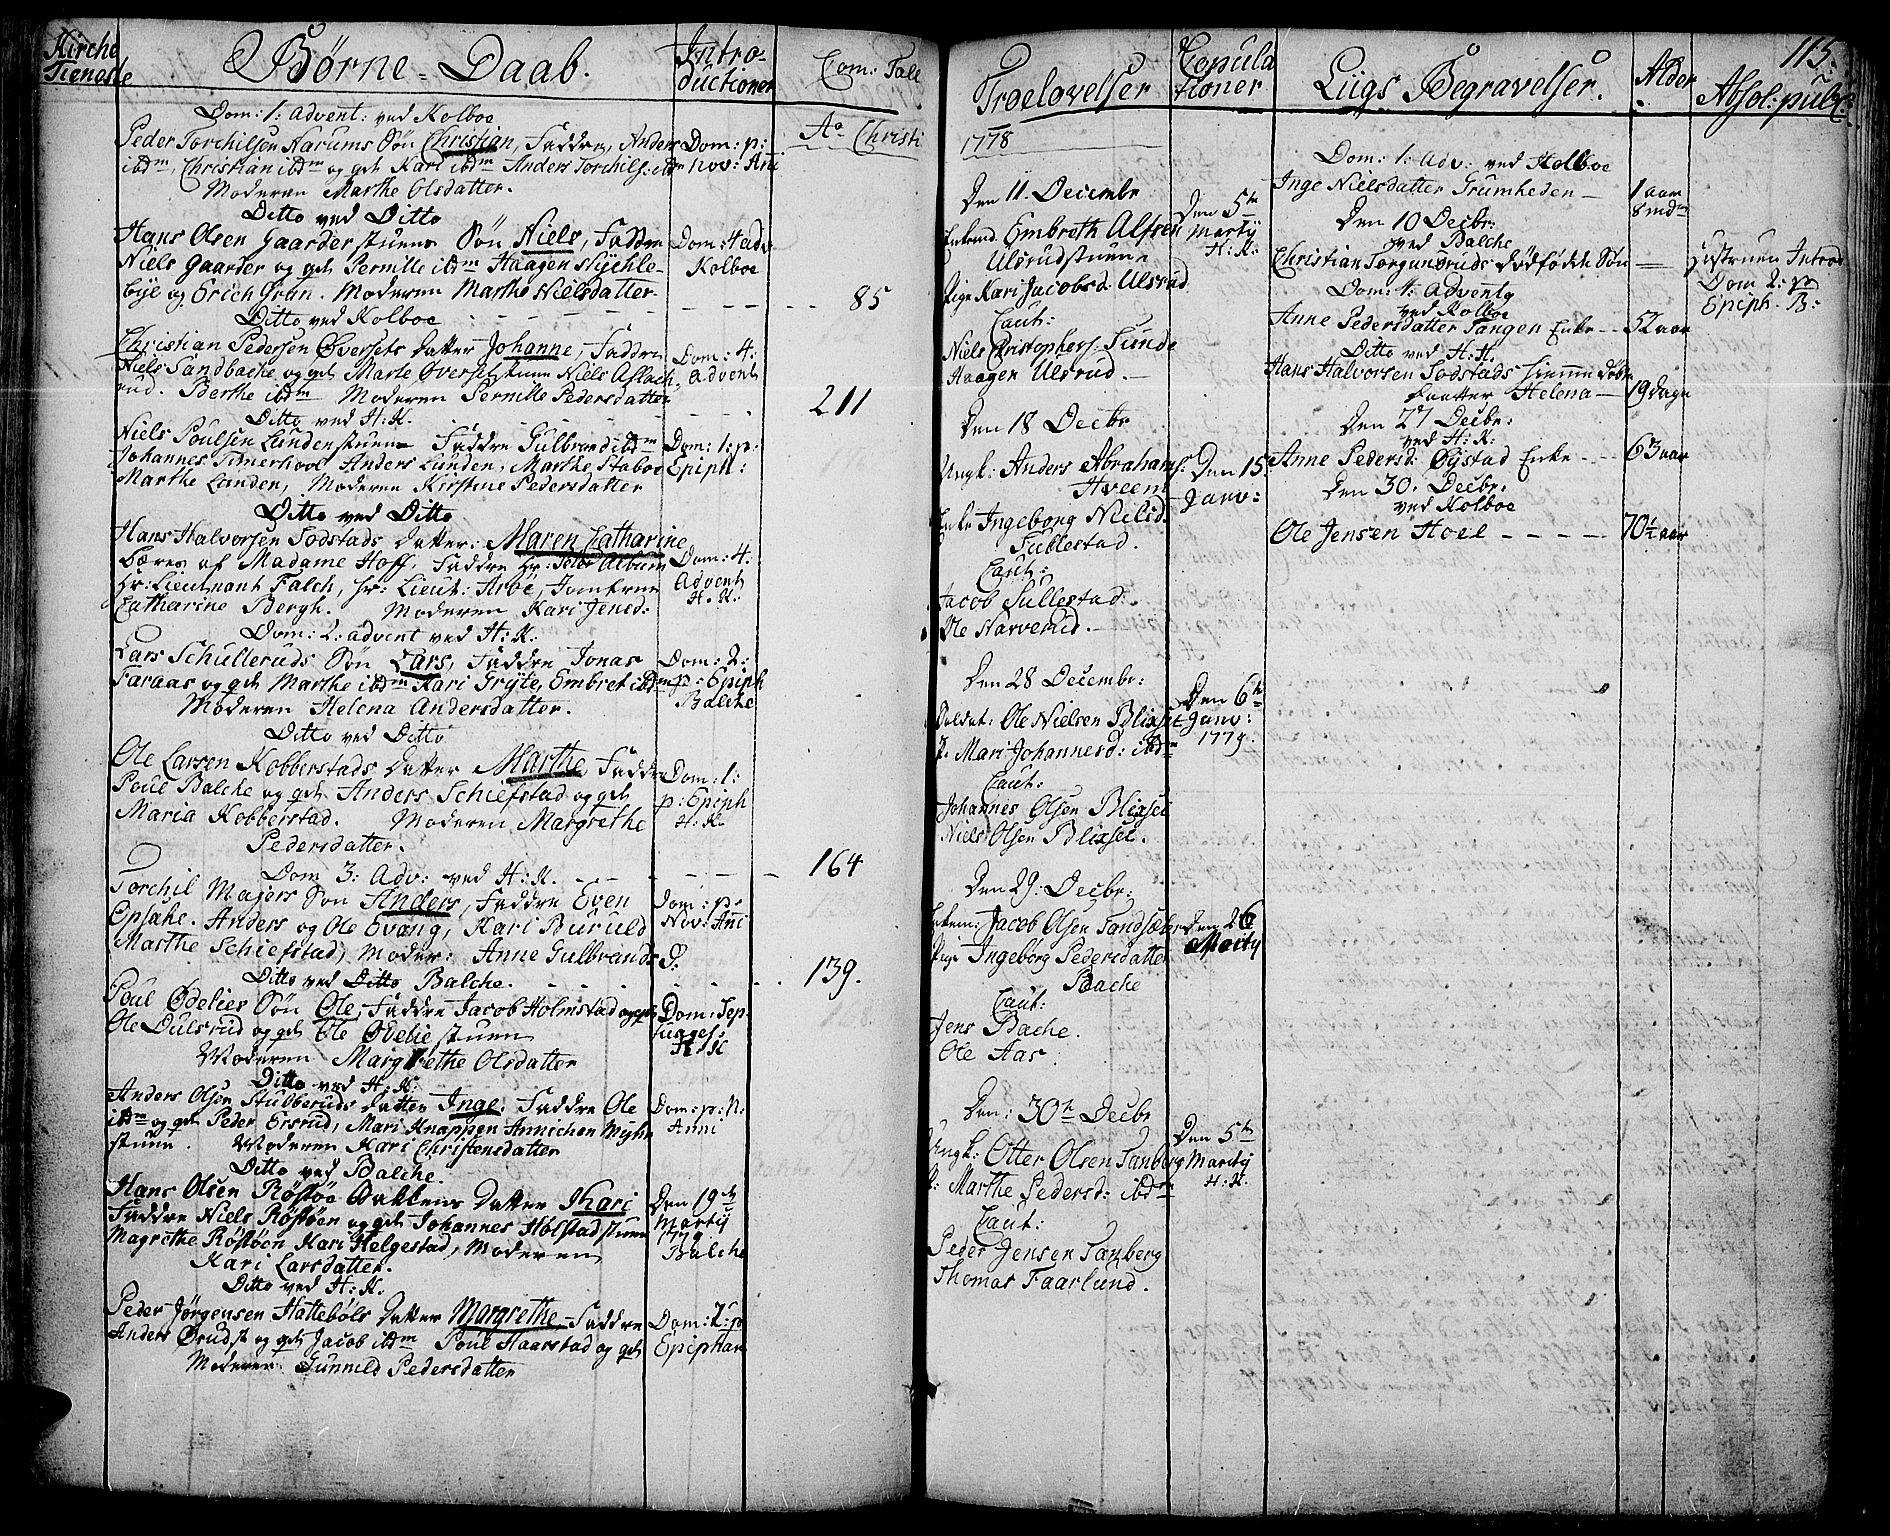 SAH, Toten prestekontor, Ministerialbok nr. 6, 1773-1793, s. 115